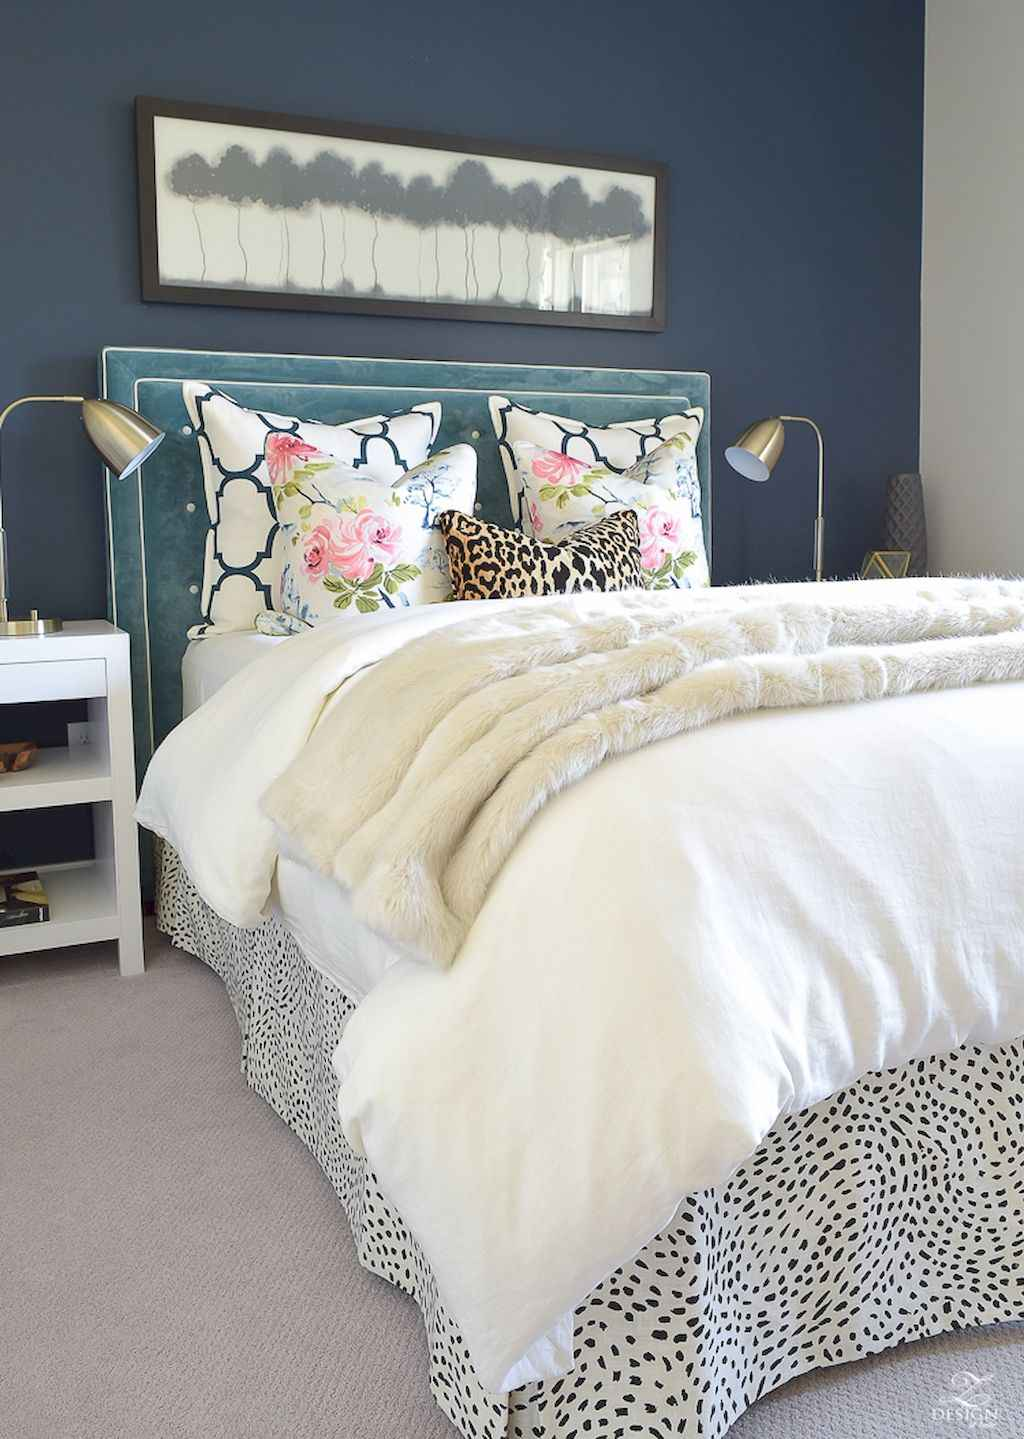 Incredible master bedroom ideas (32)